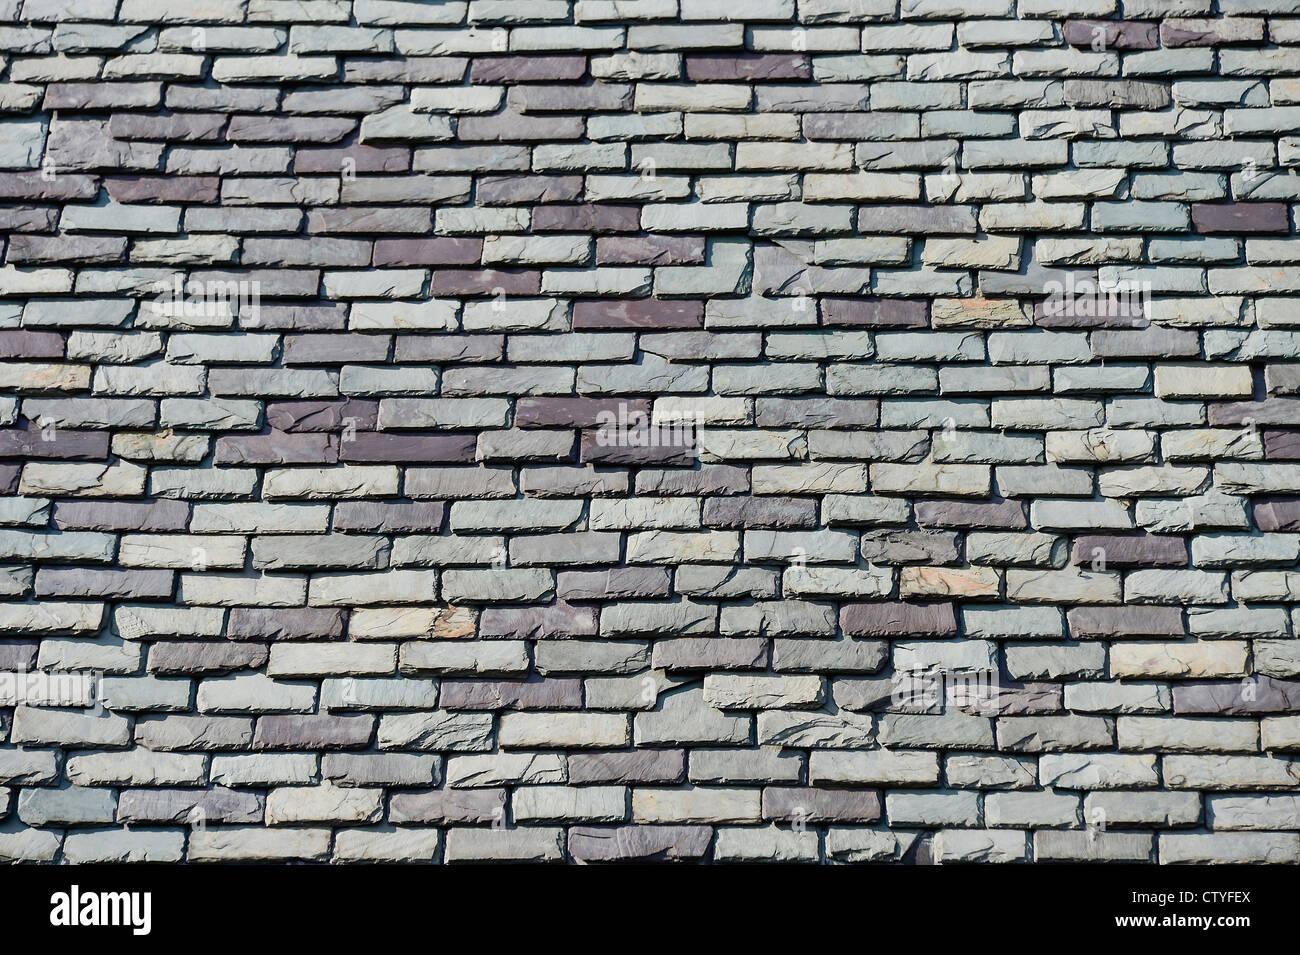 Slate roof detail. - Stock Image